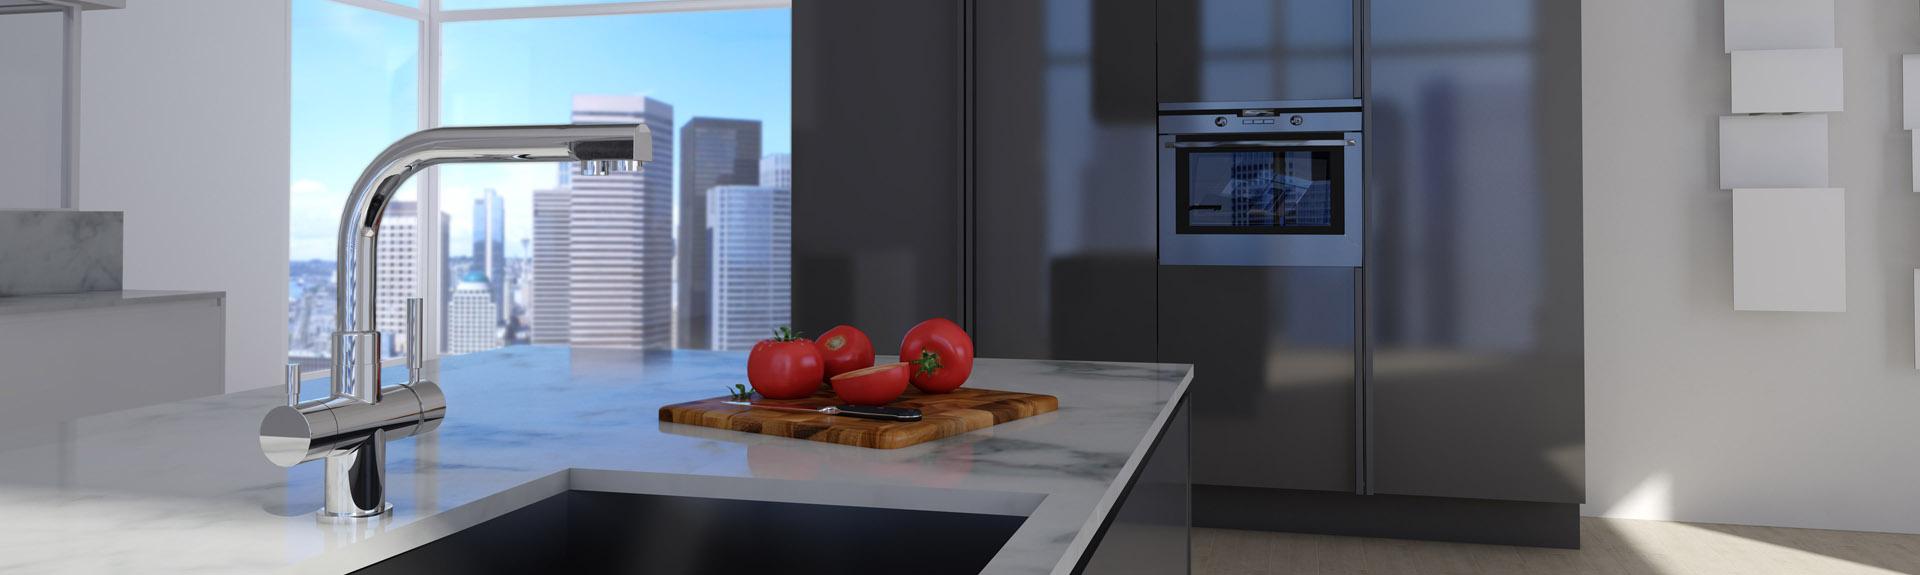 Slider Architetti Cucina